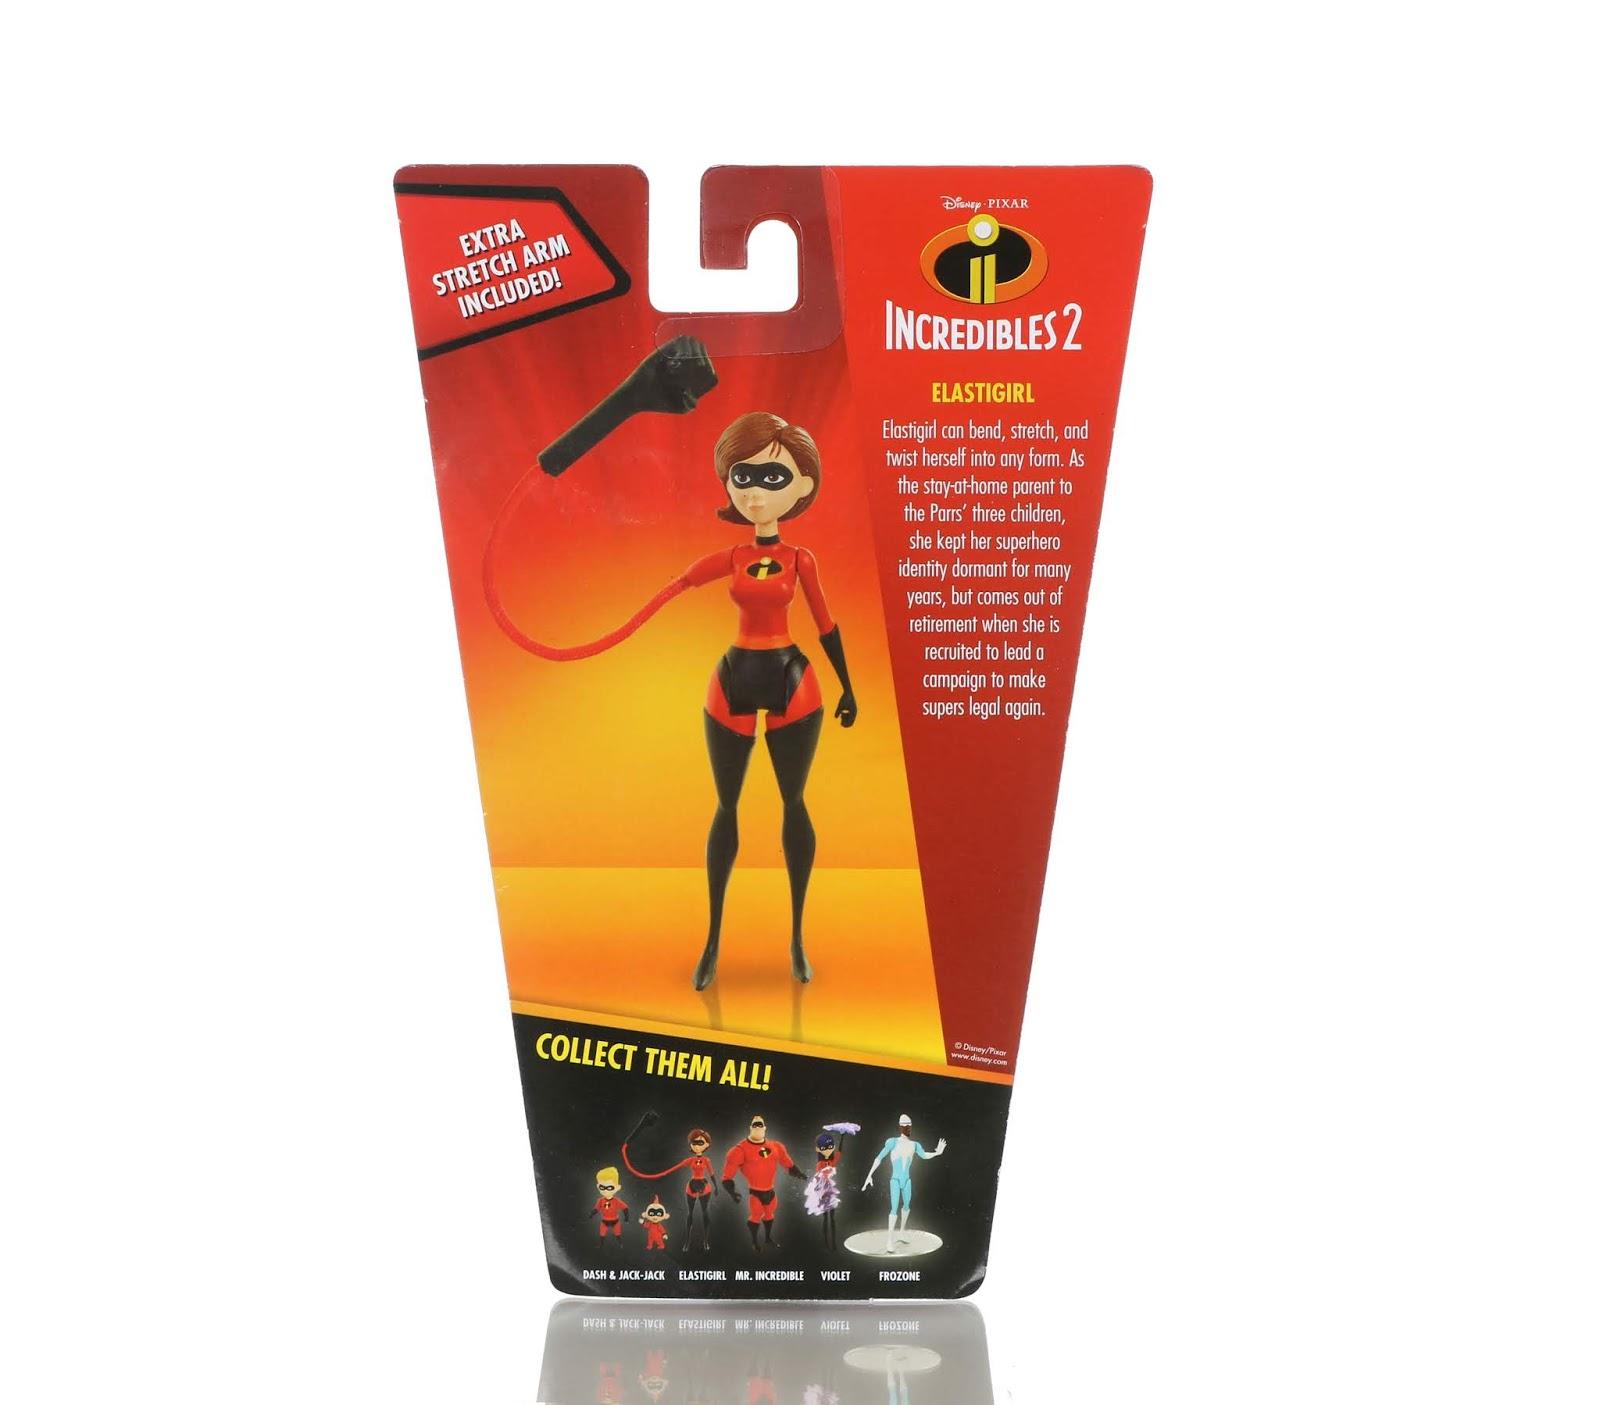 "Incredibles 2 Jakks Pacific 4"" Action Figure Collection Review"